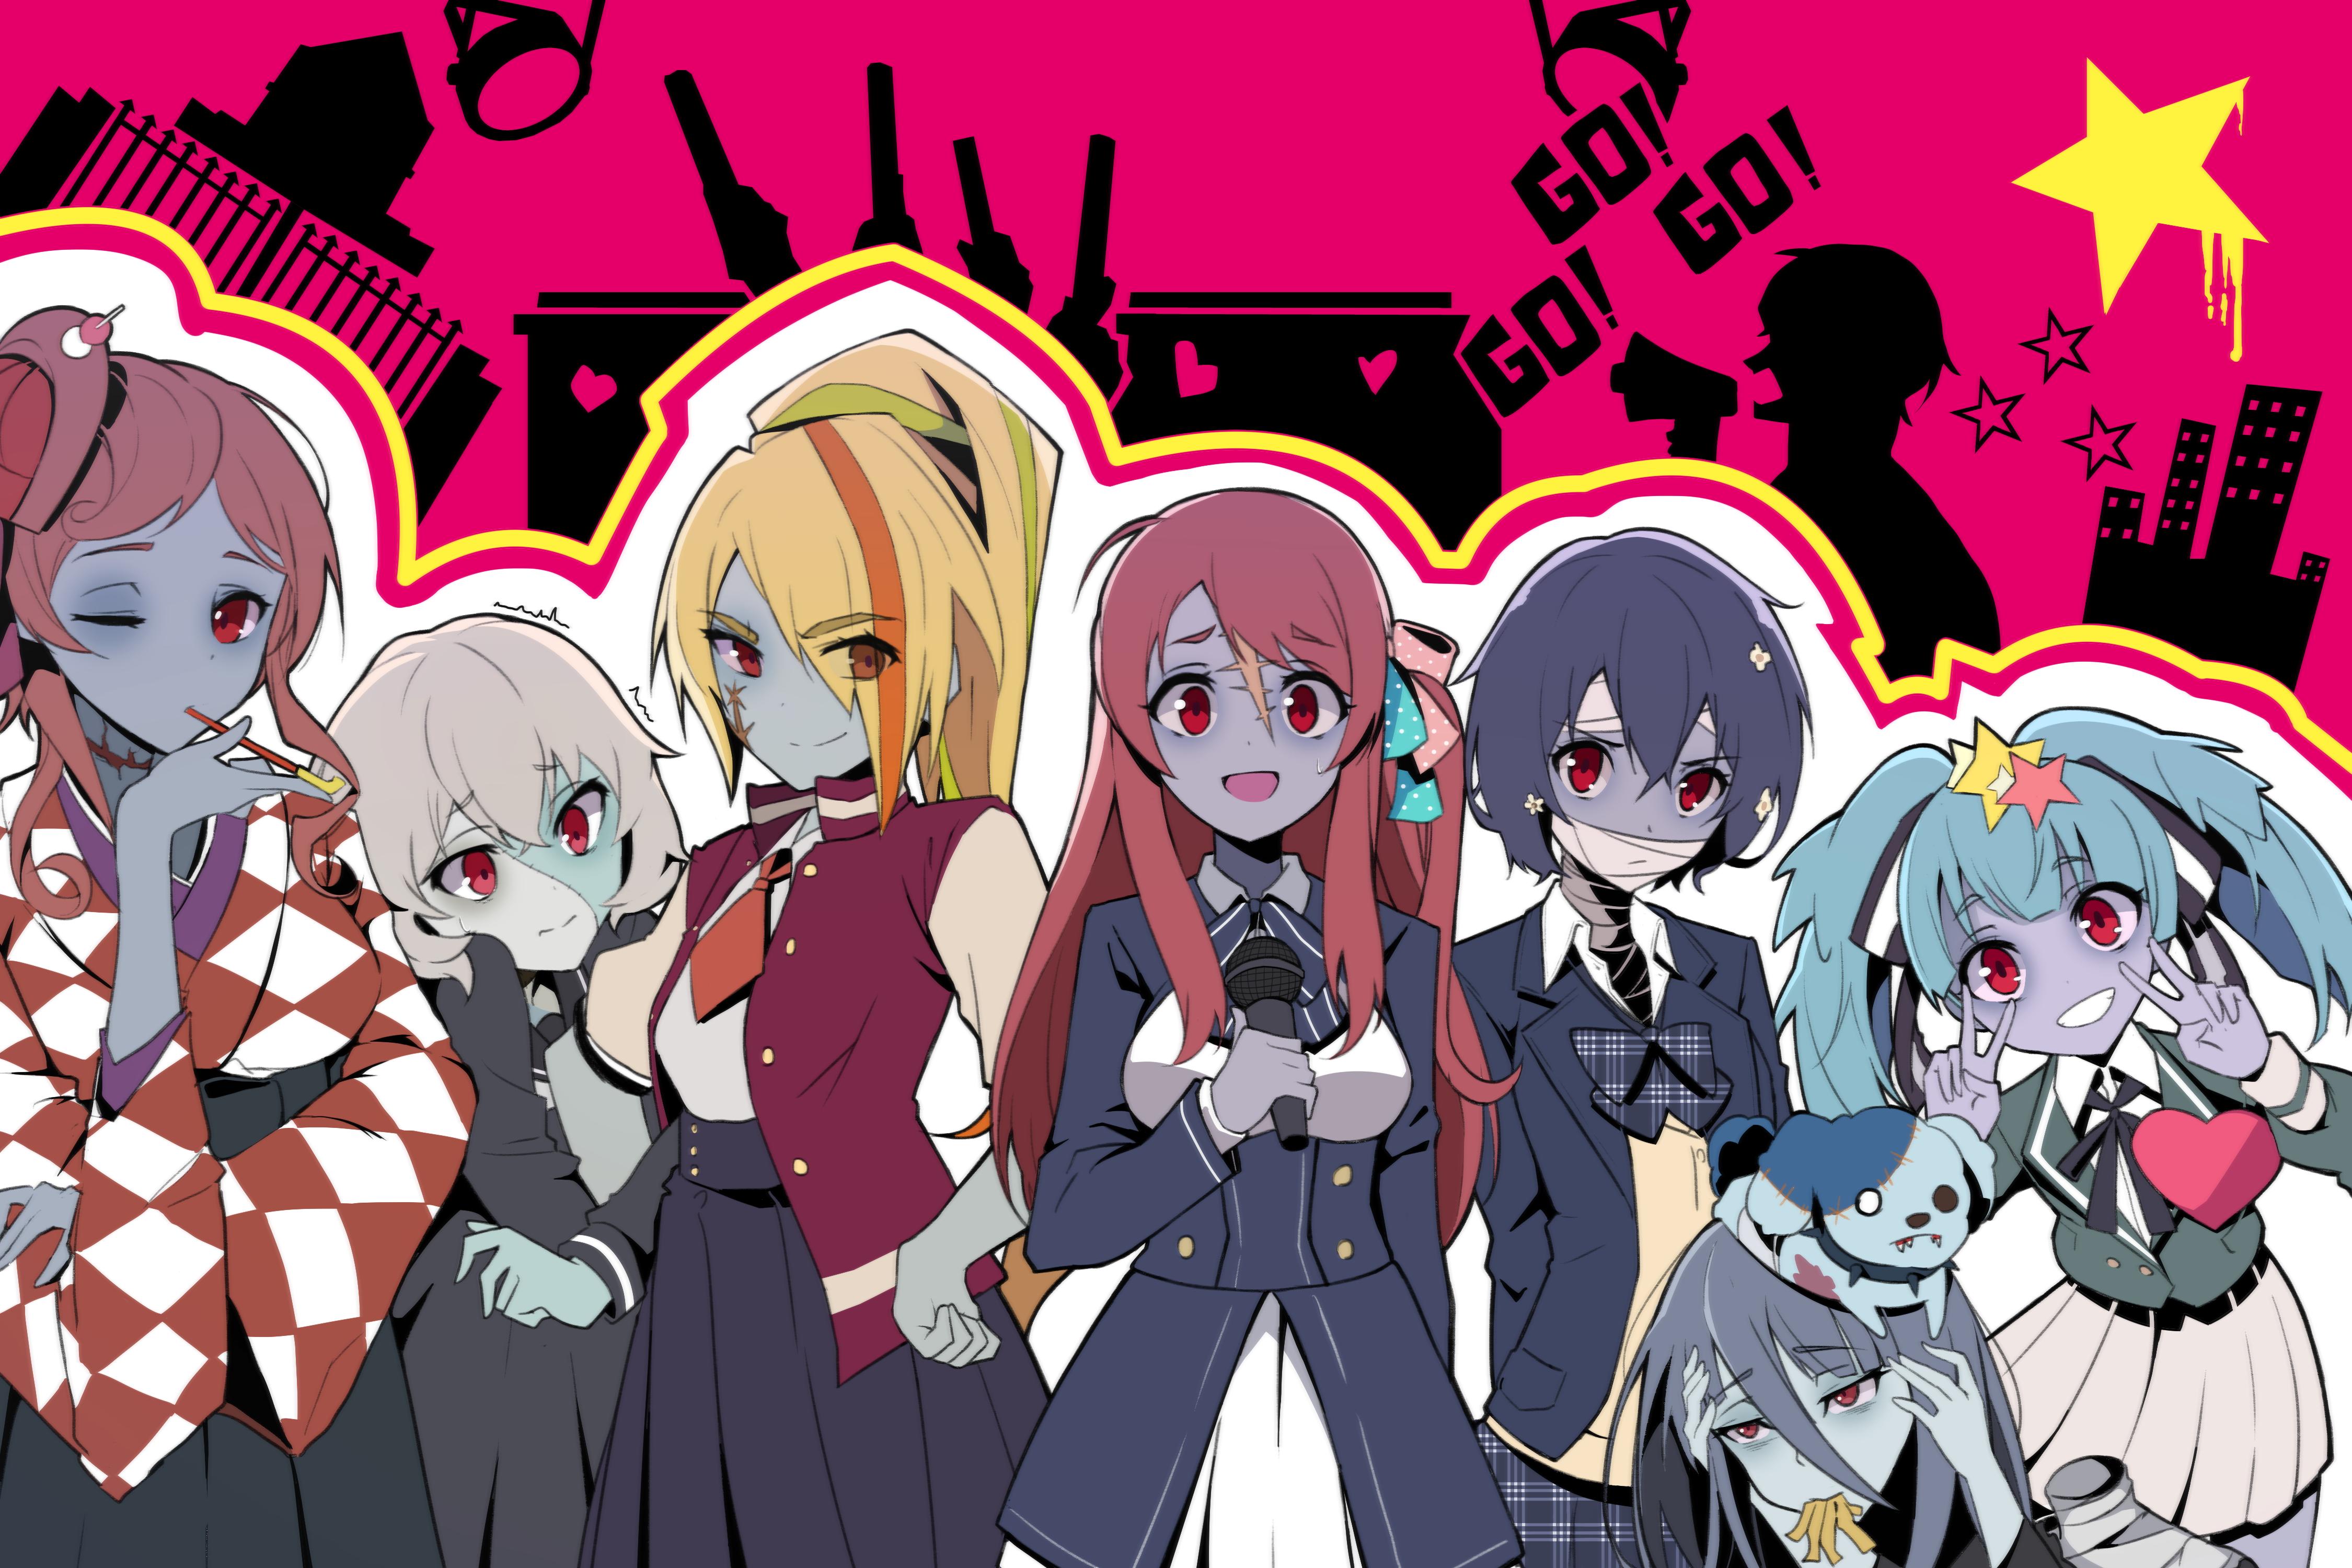 Zombieland Saga Anime Girls Zombie 0 Tae Yamada Zombie 1 Sakura Minamoto Zombie 2 Saki Nikaidou Zomb 4500x3000